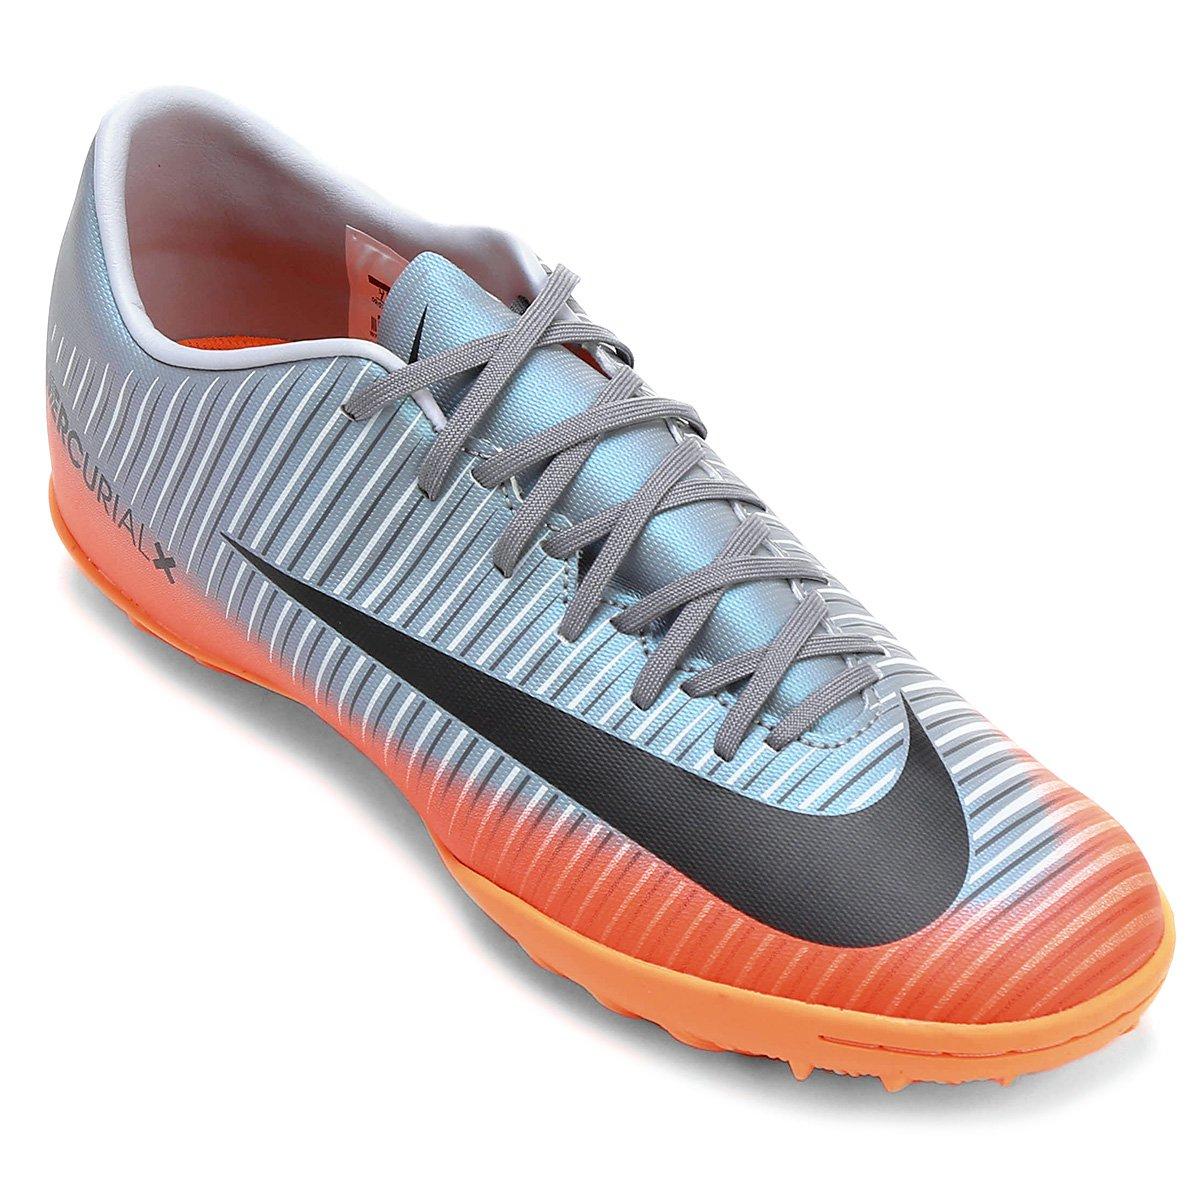 ae88561fc59d1 Chuteira Society Nike Mercurial X Victory 6 CR7 TF - Compre Agora ...